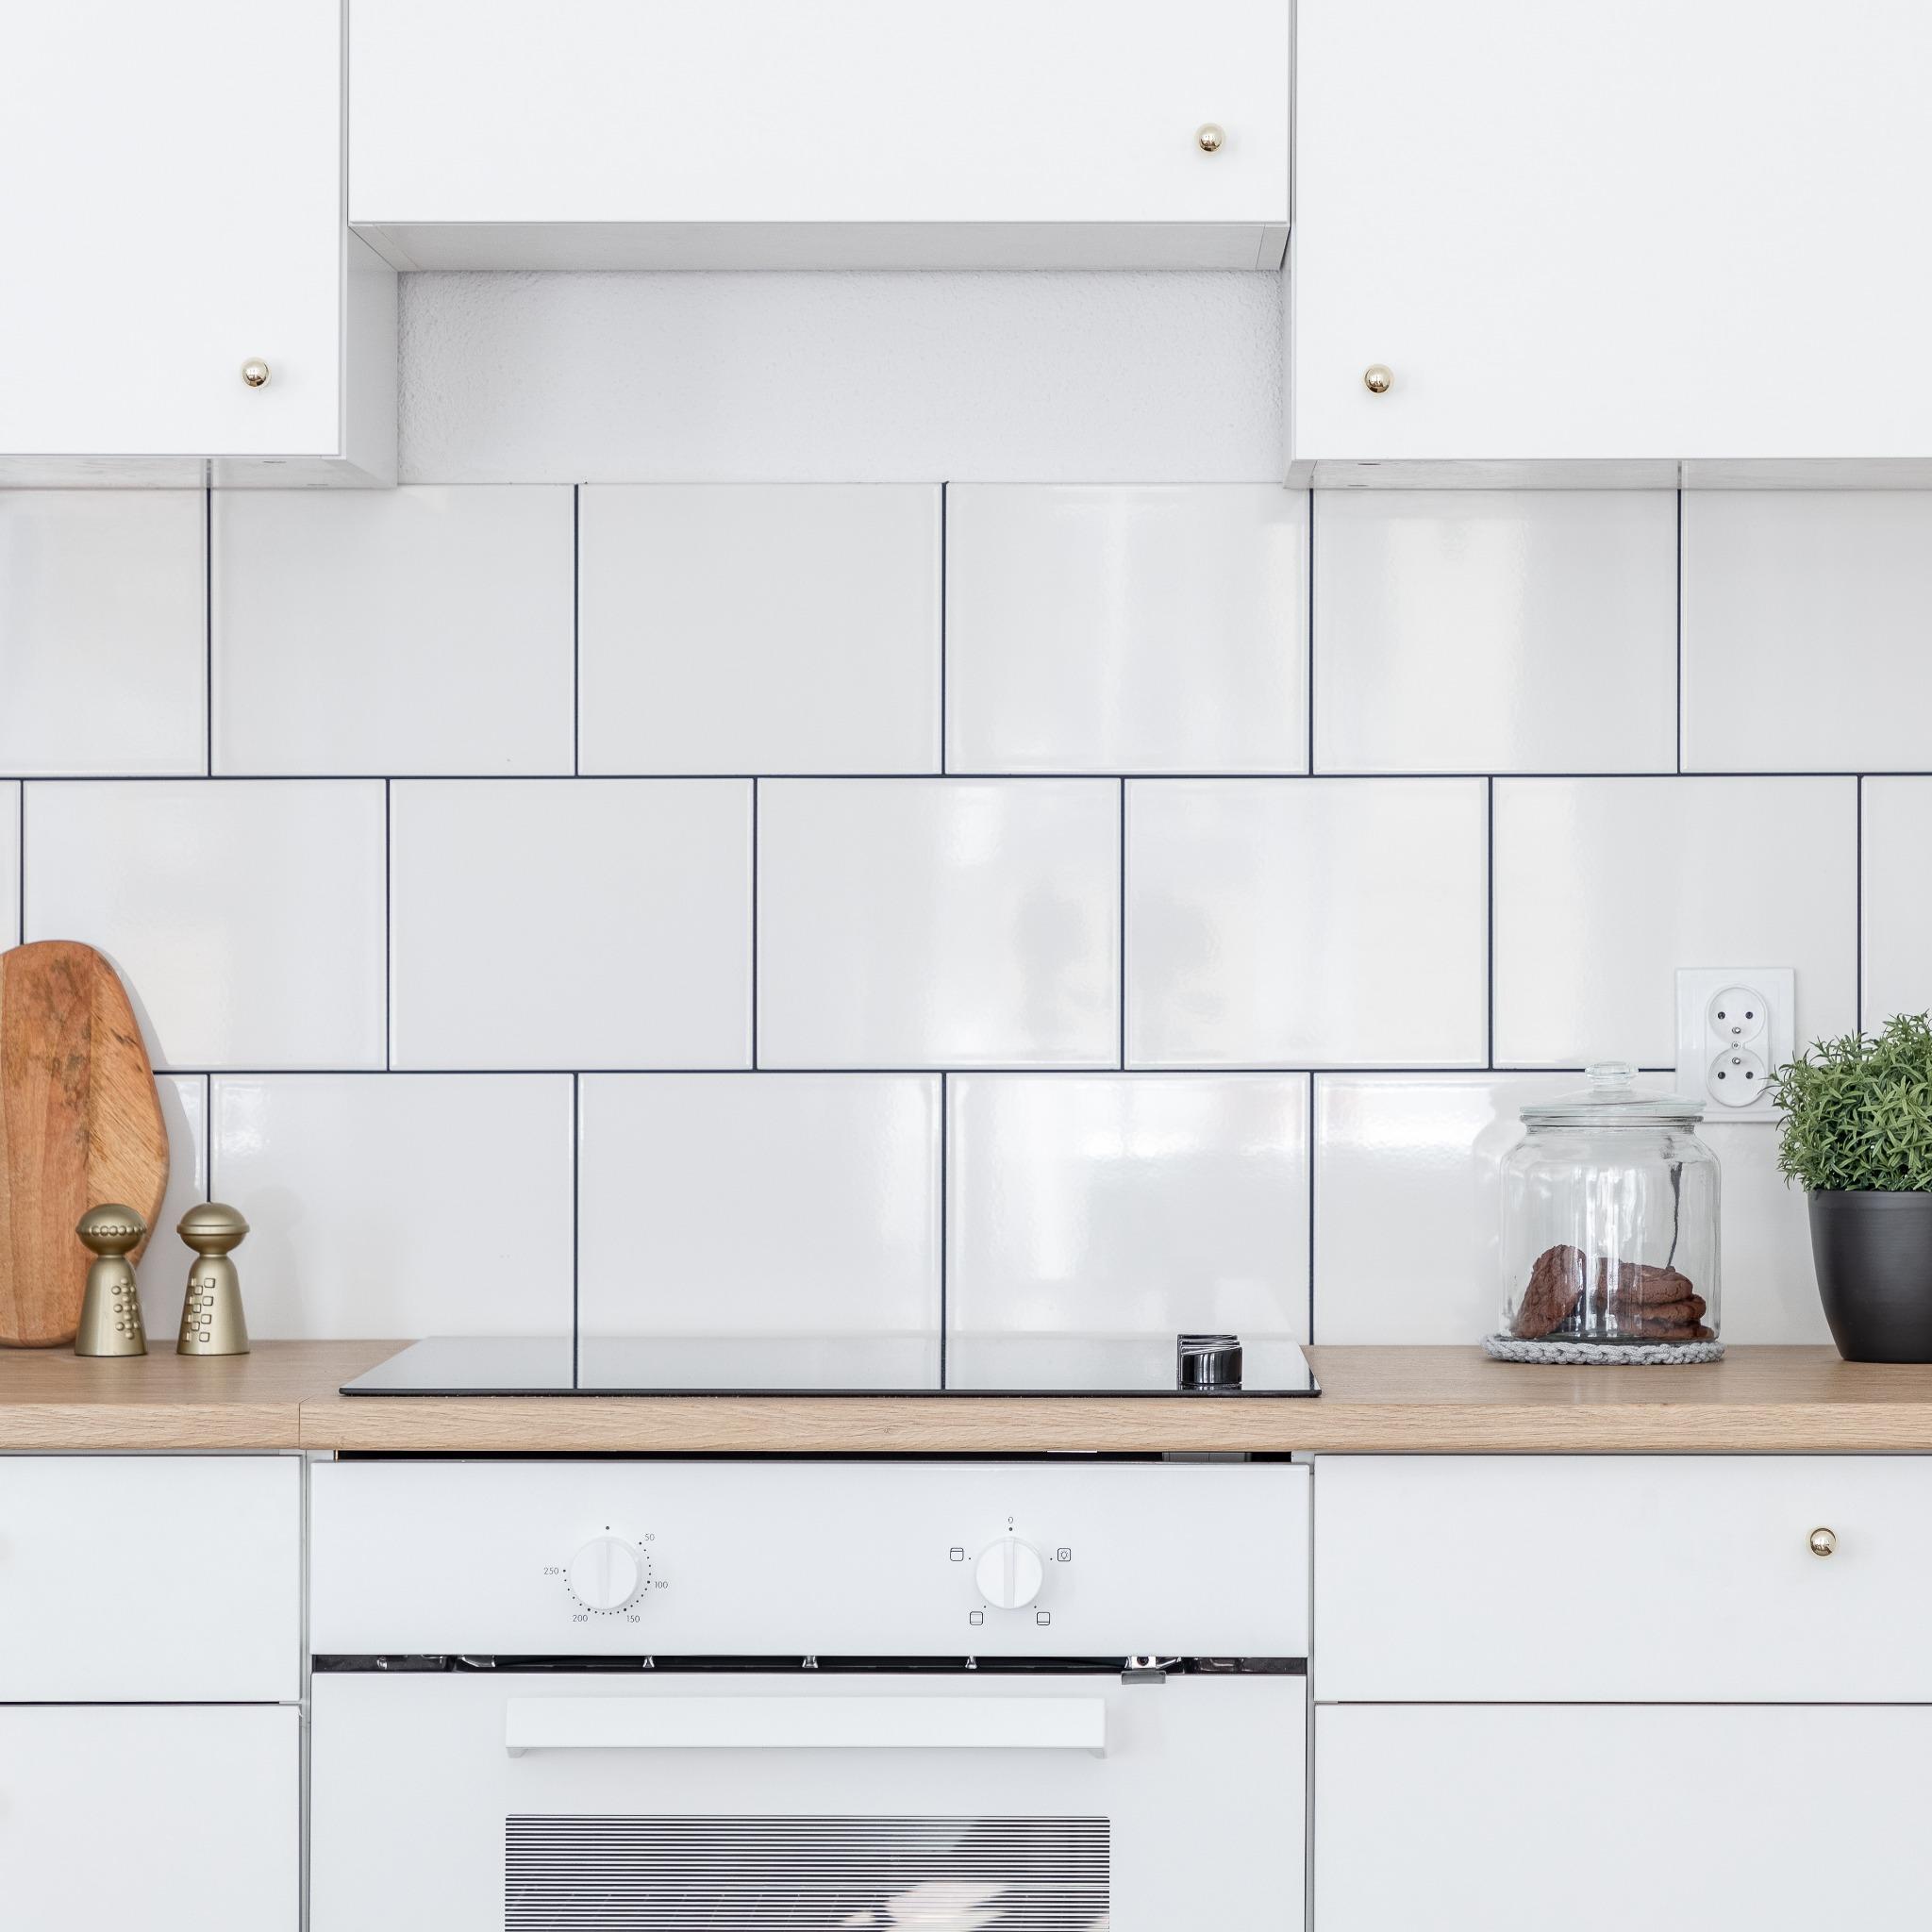 A white kitchen with a square tile backsplash/